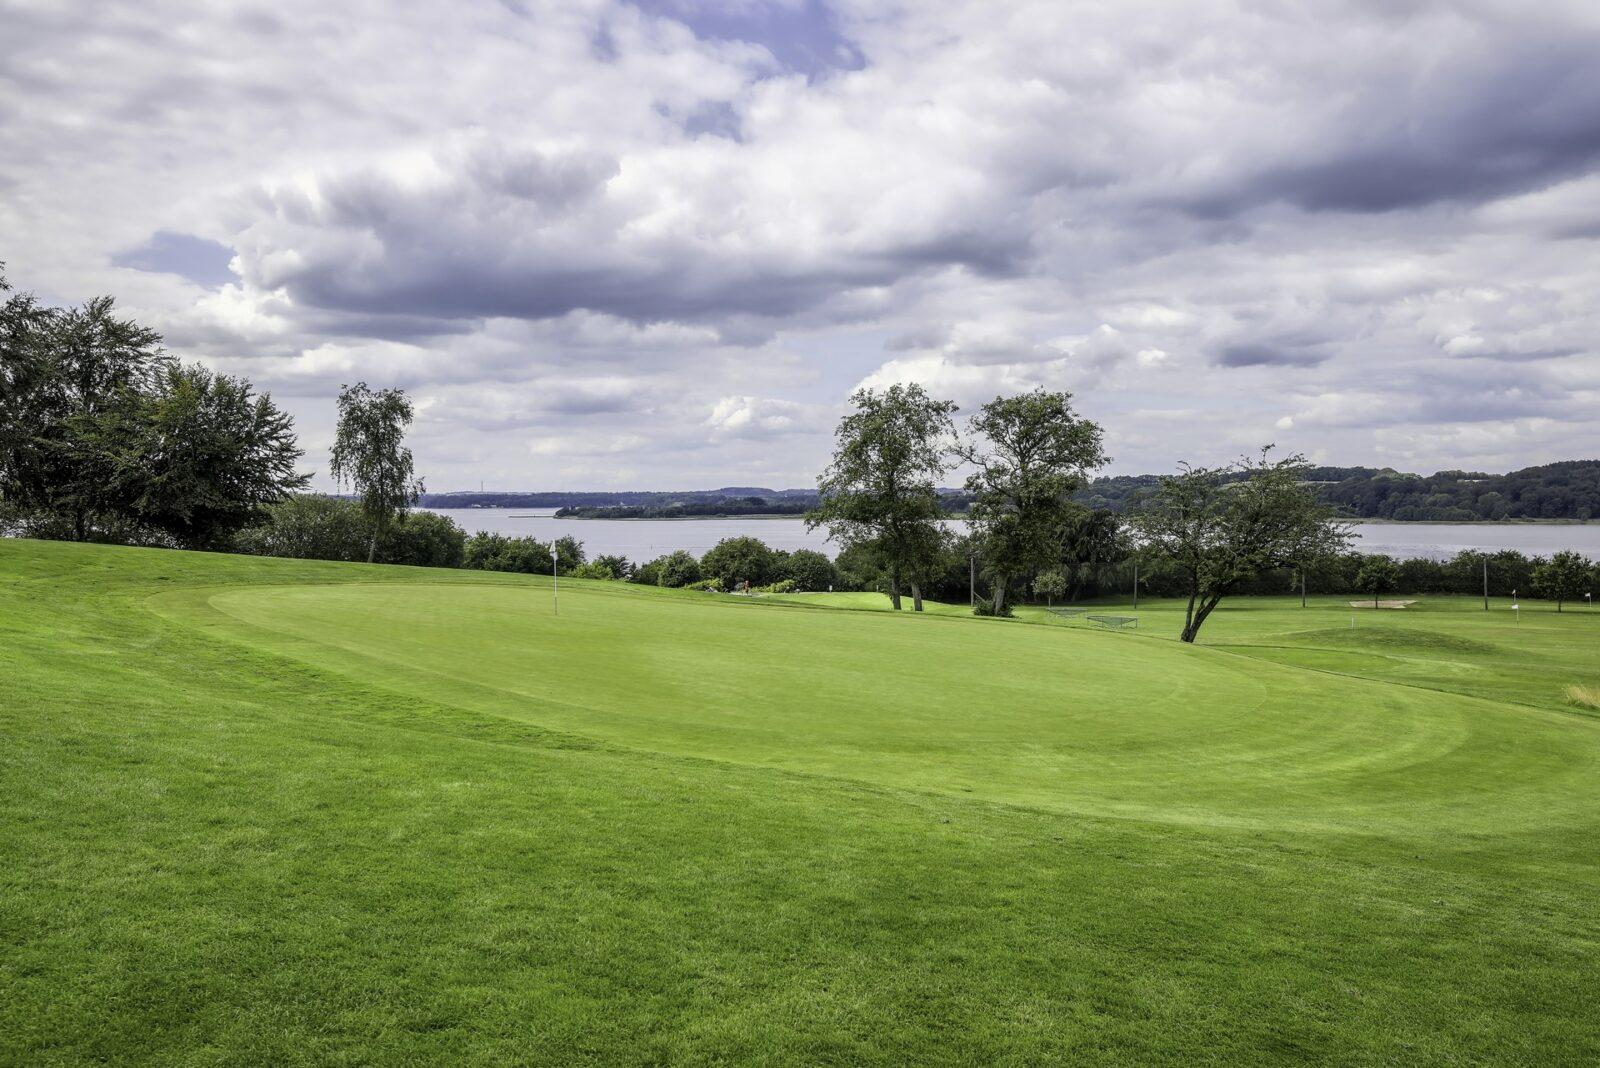 Gol Gourmet.dk Mariagerfjord Golfklub HDR foto 1